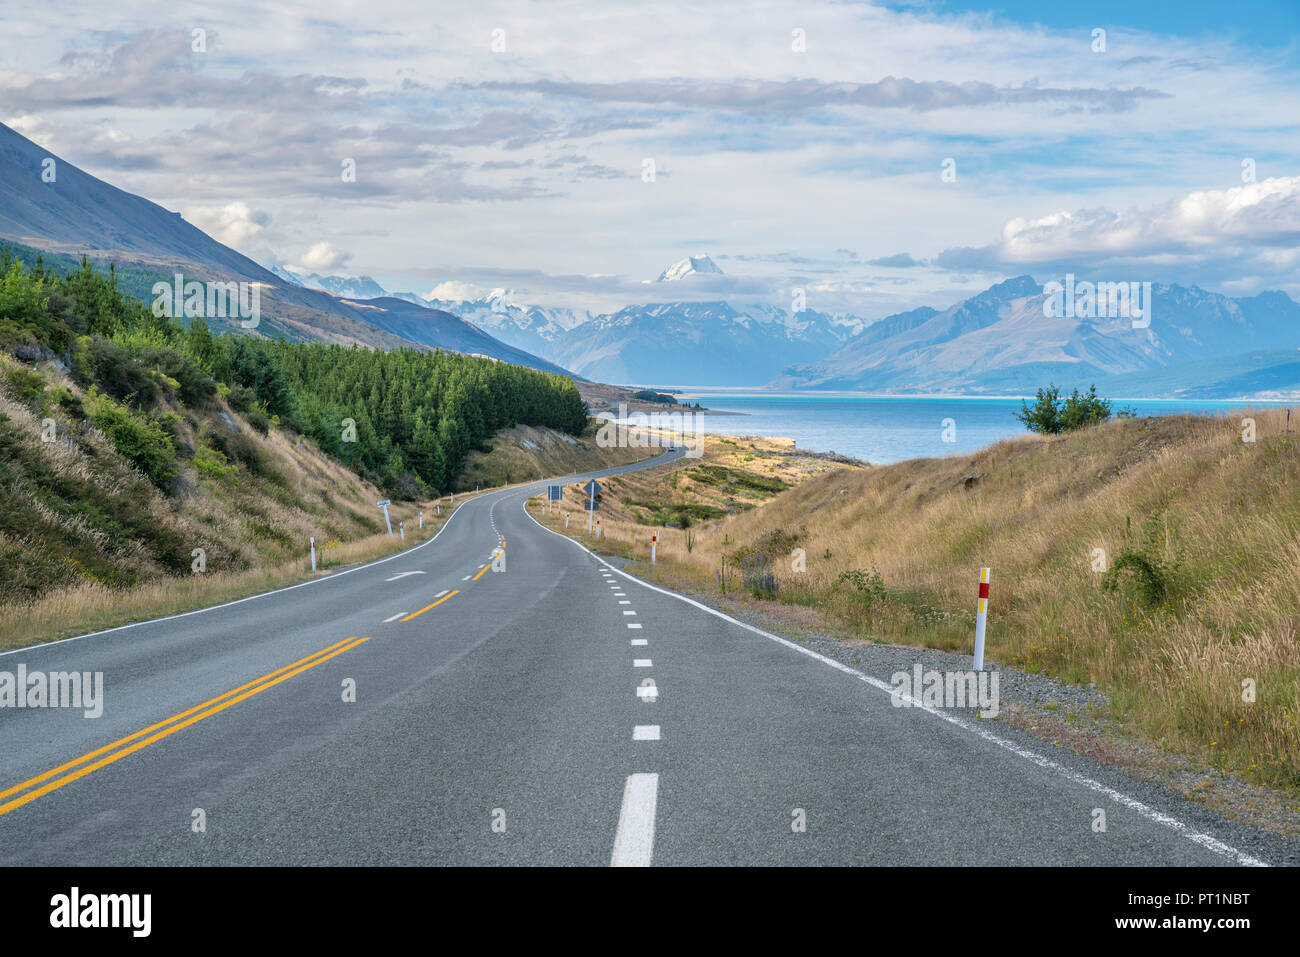 Road alongside Lake Pukaki, looking towards Mt Cook mountain range, Ben Ohau, Mackenzie district, Canterbury region, South Island, New Zealand, Stock Photo